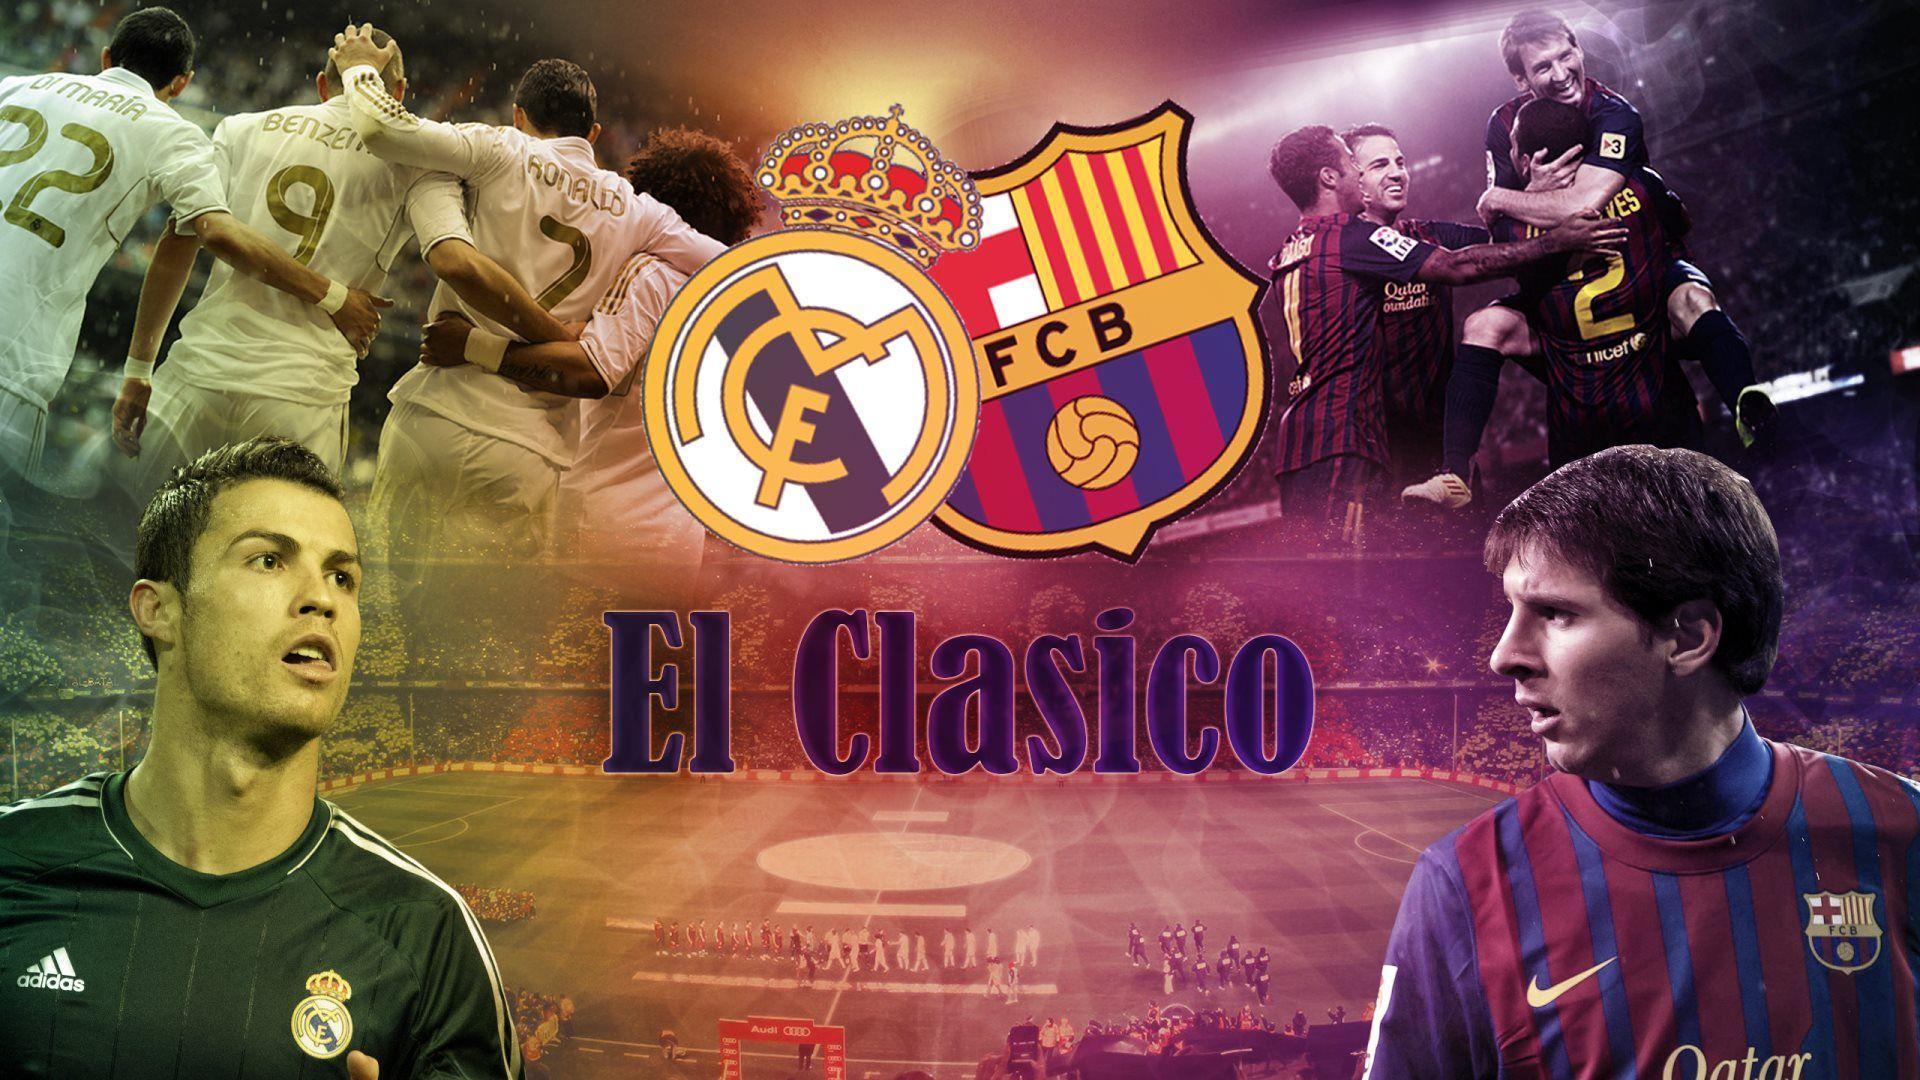 el clasico El clasico 15 likes 13 talking about this fifa soccer: recruitment: 95+ovr owner: #realmadrid facebook: @el clasico.